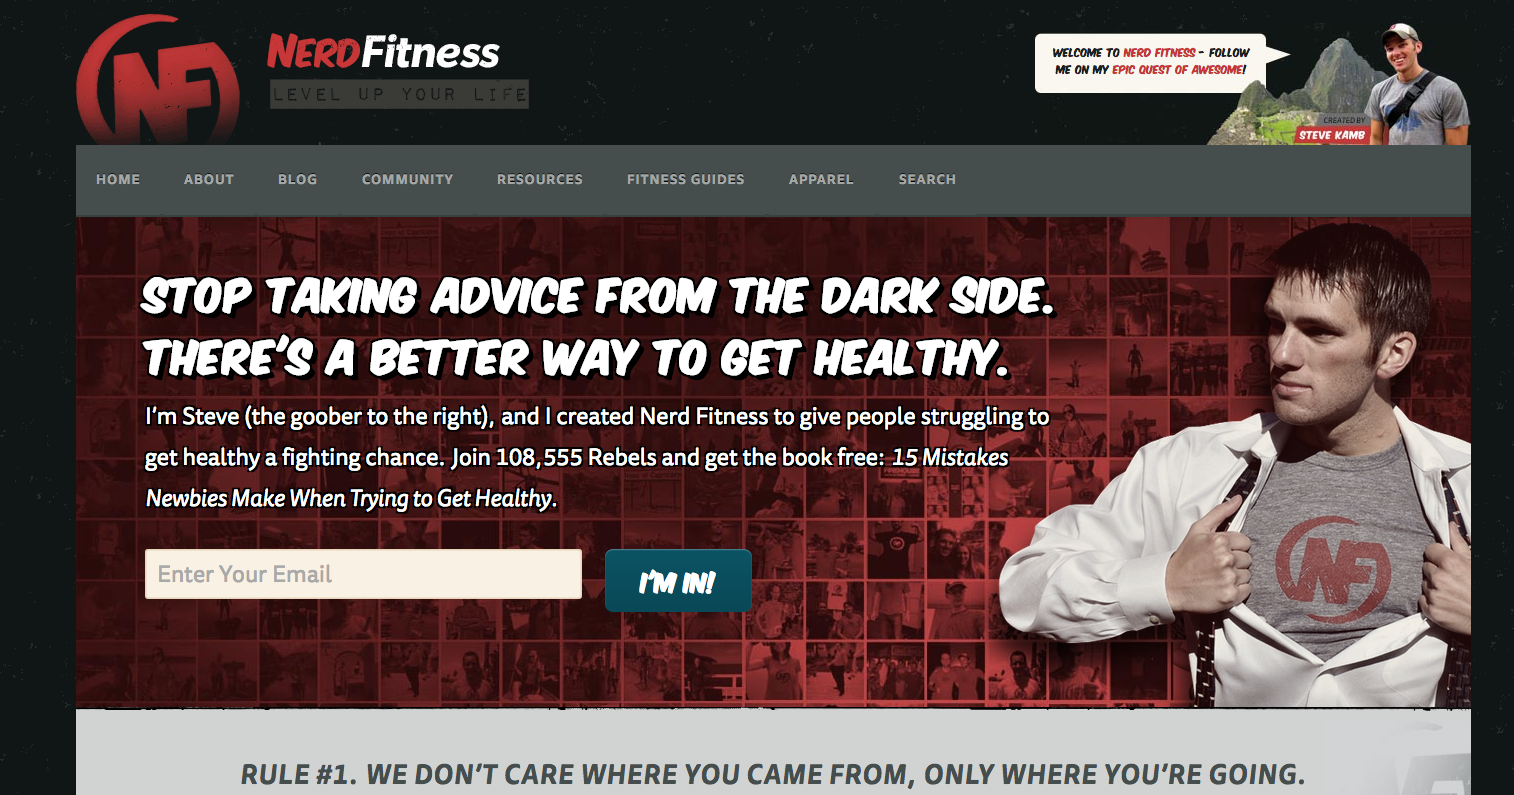 6. Nerd Fitness